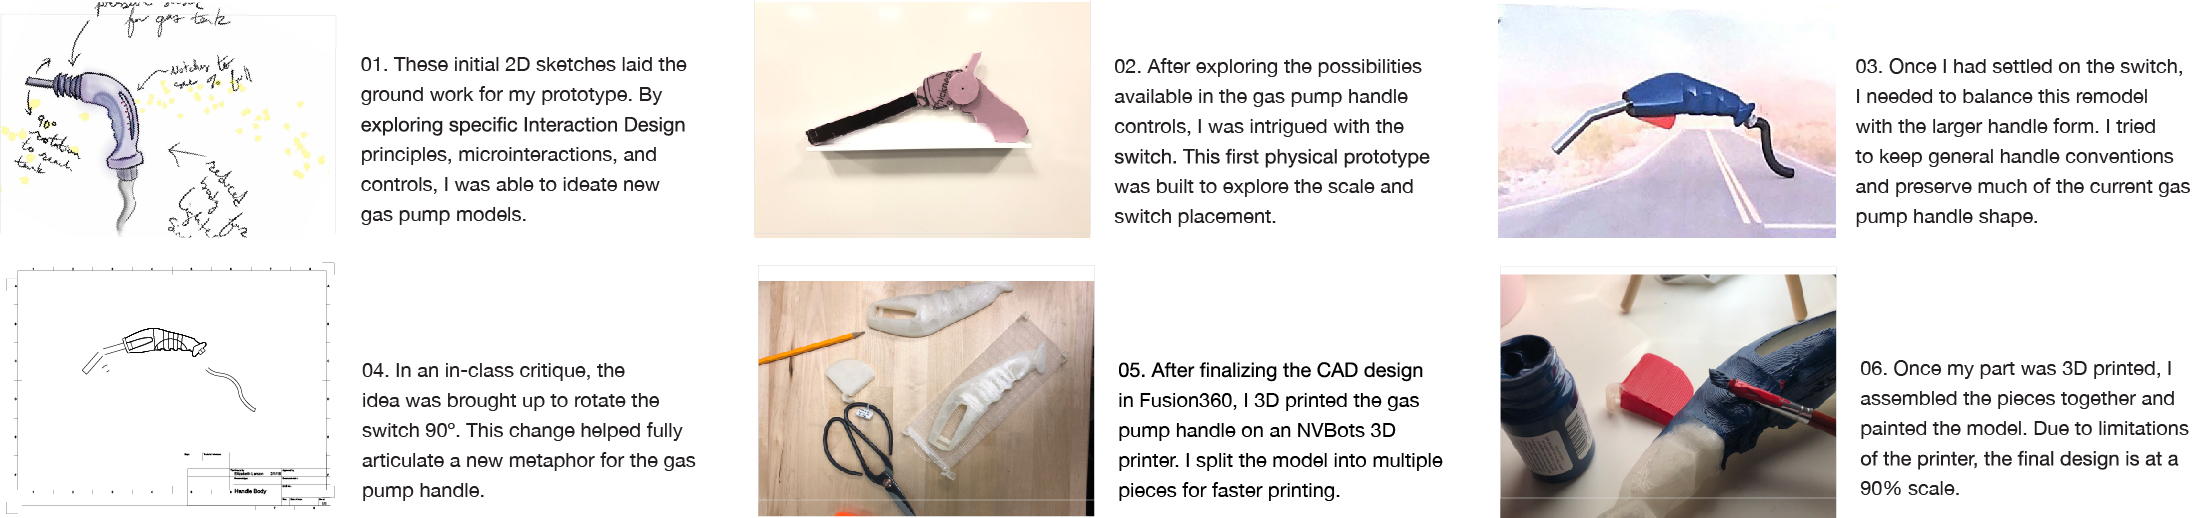 gas pump process@2x-100.jpg